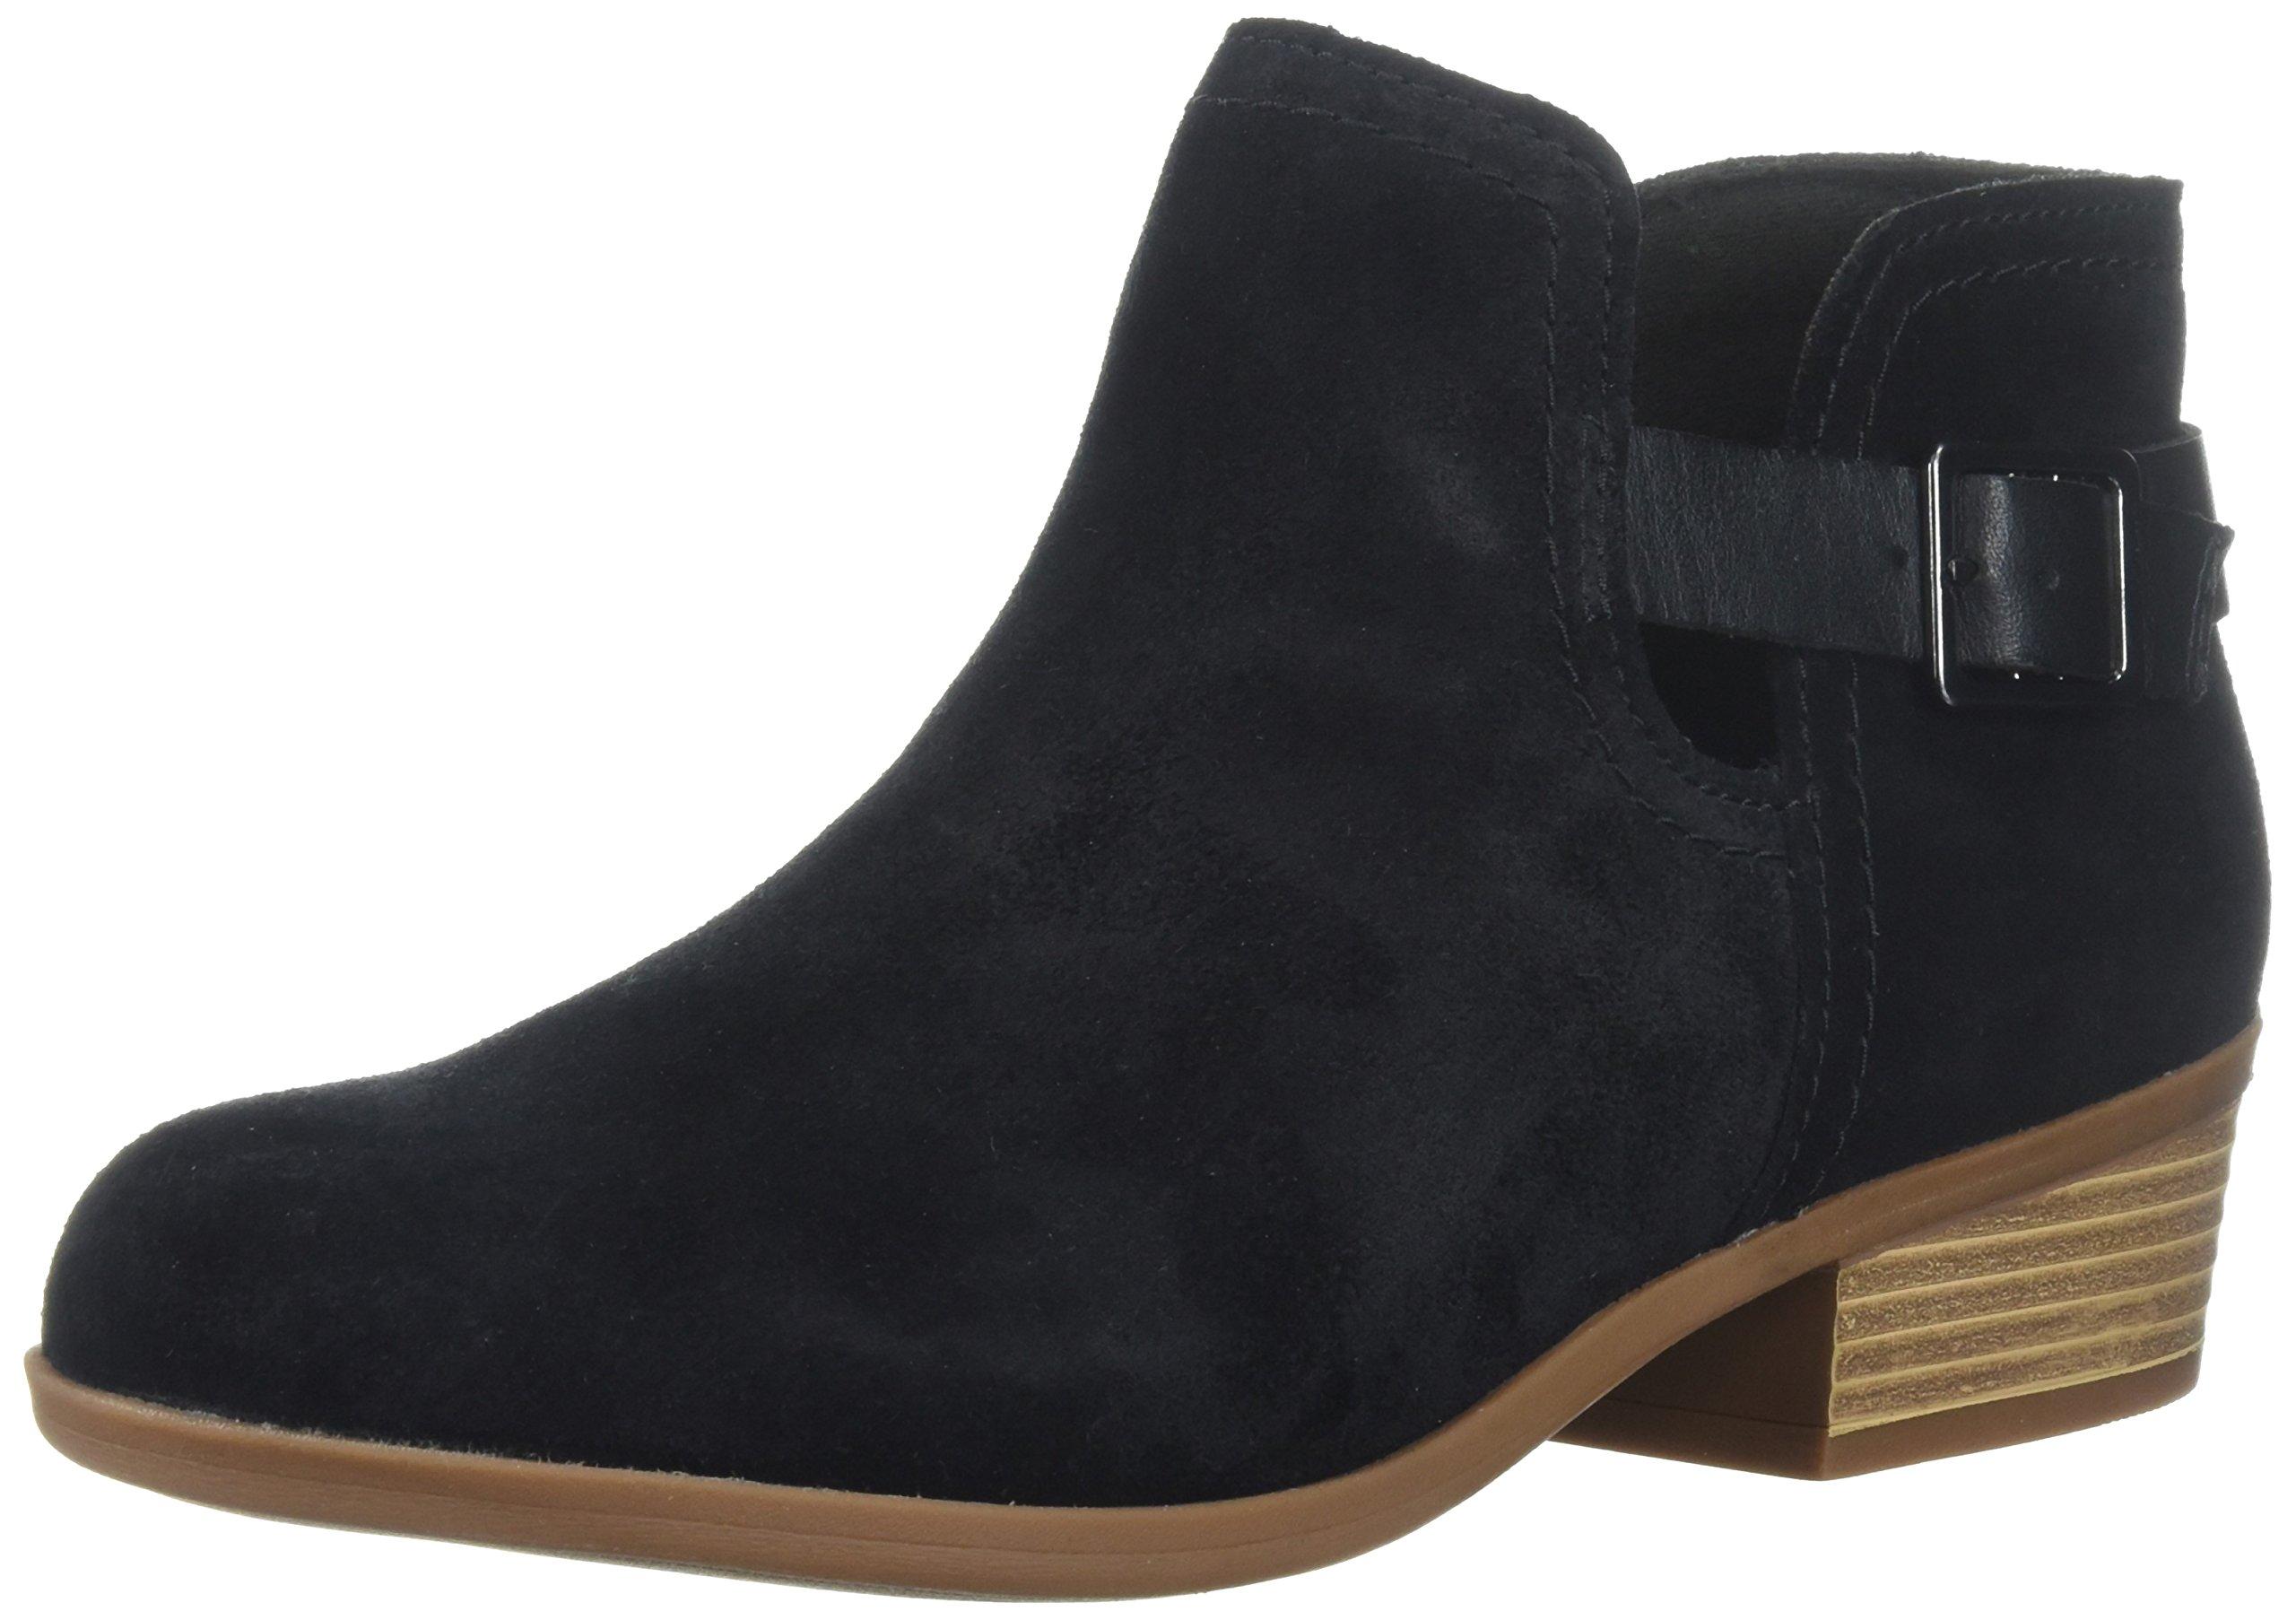 CLARKS Women's Addiy Carisa Ankle Boot, Black Suede, 9.5 Medium US